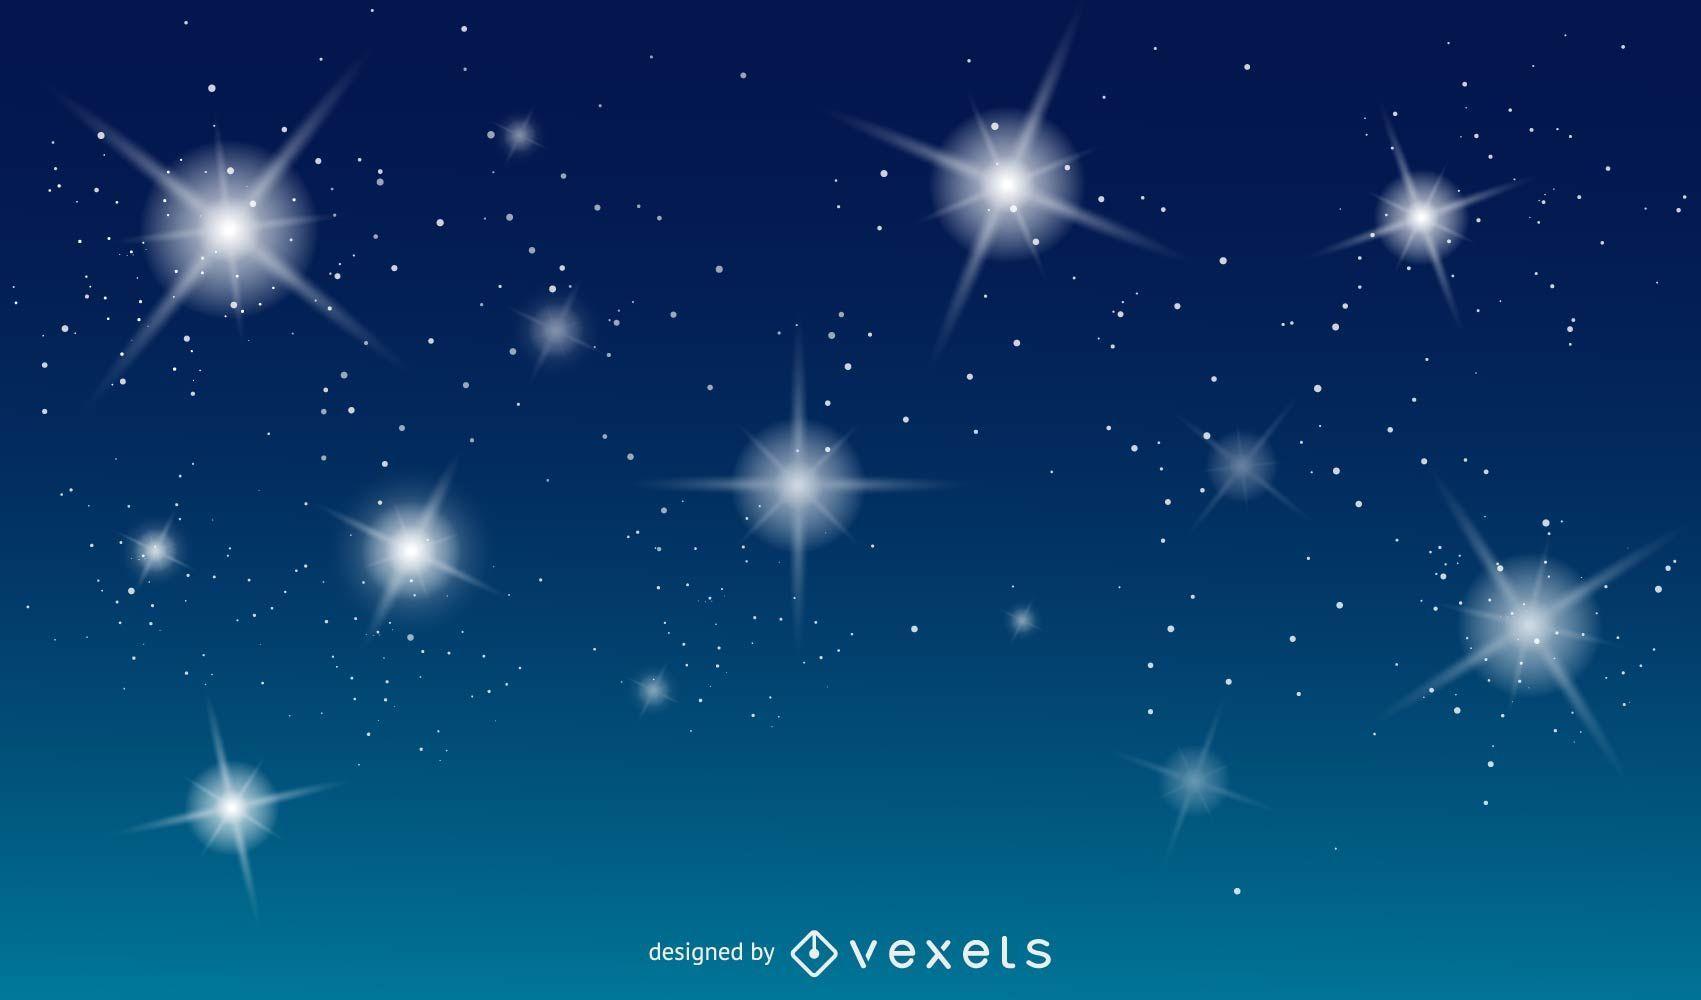 Fondo de vector azul con estrellas